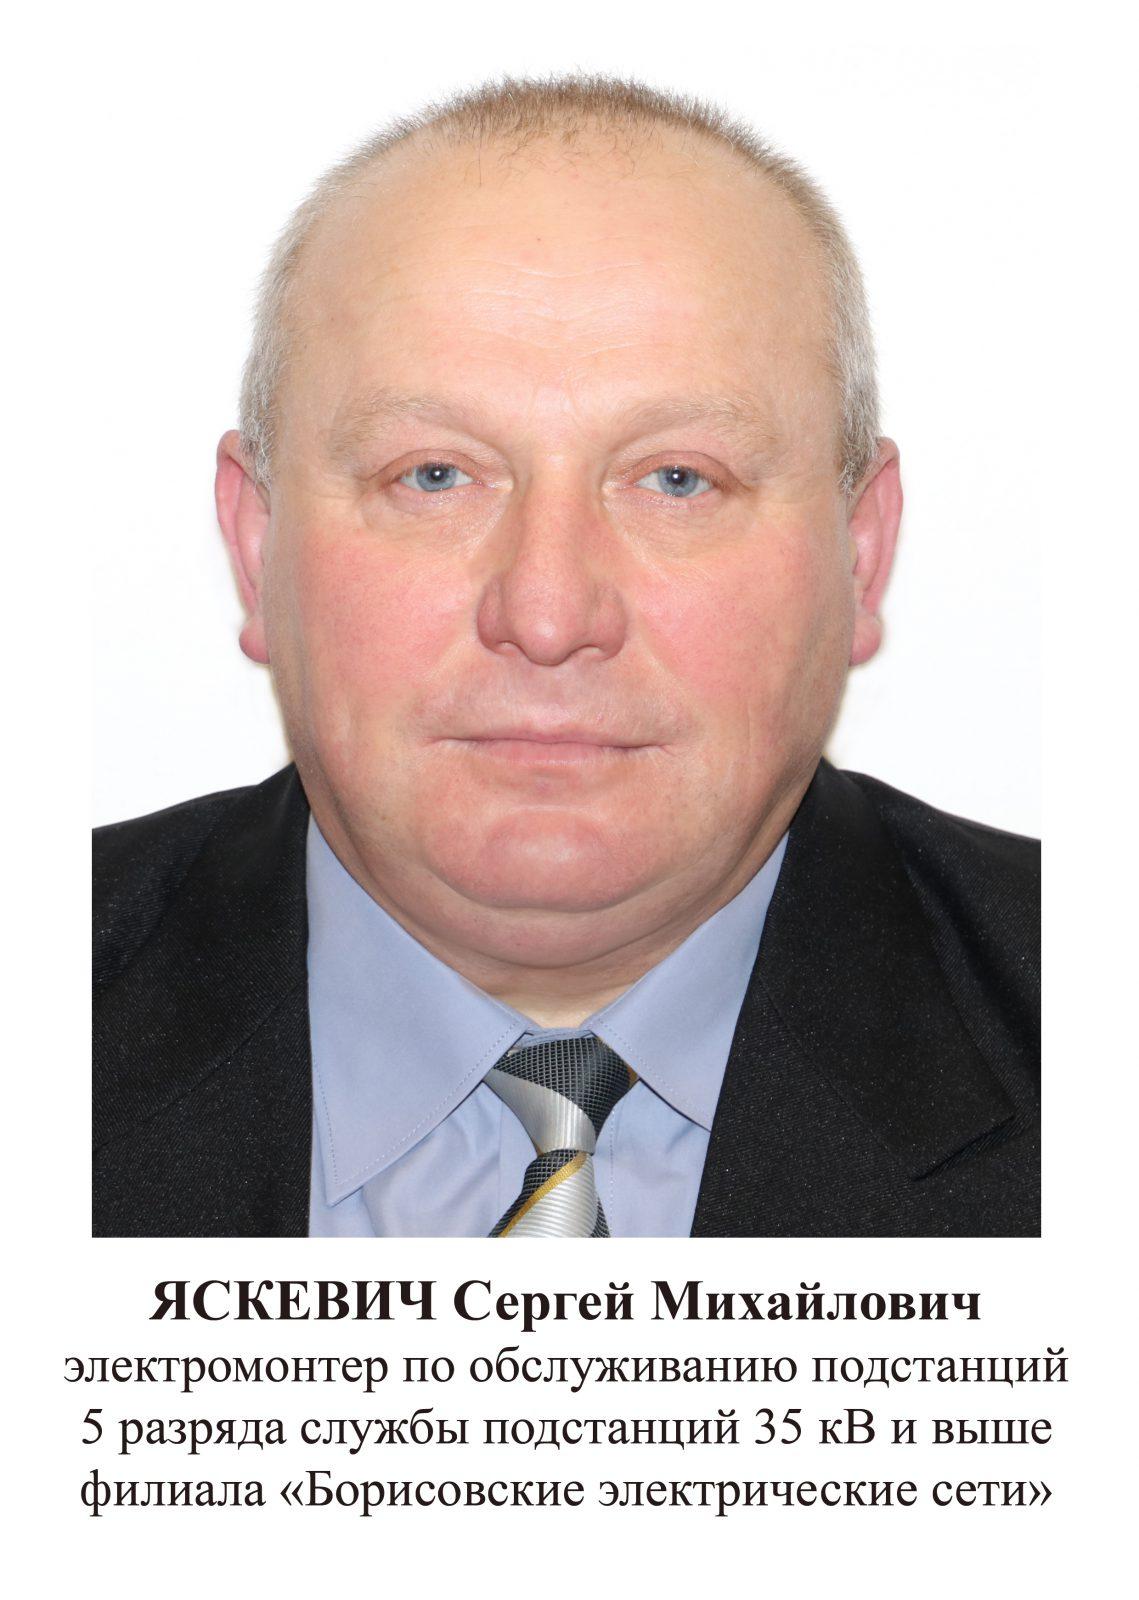 Яскевич Сергей Михайлович